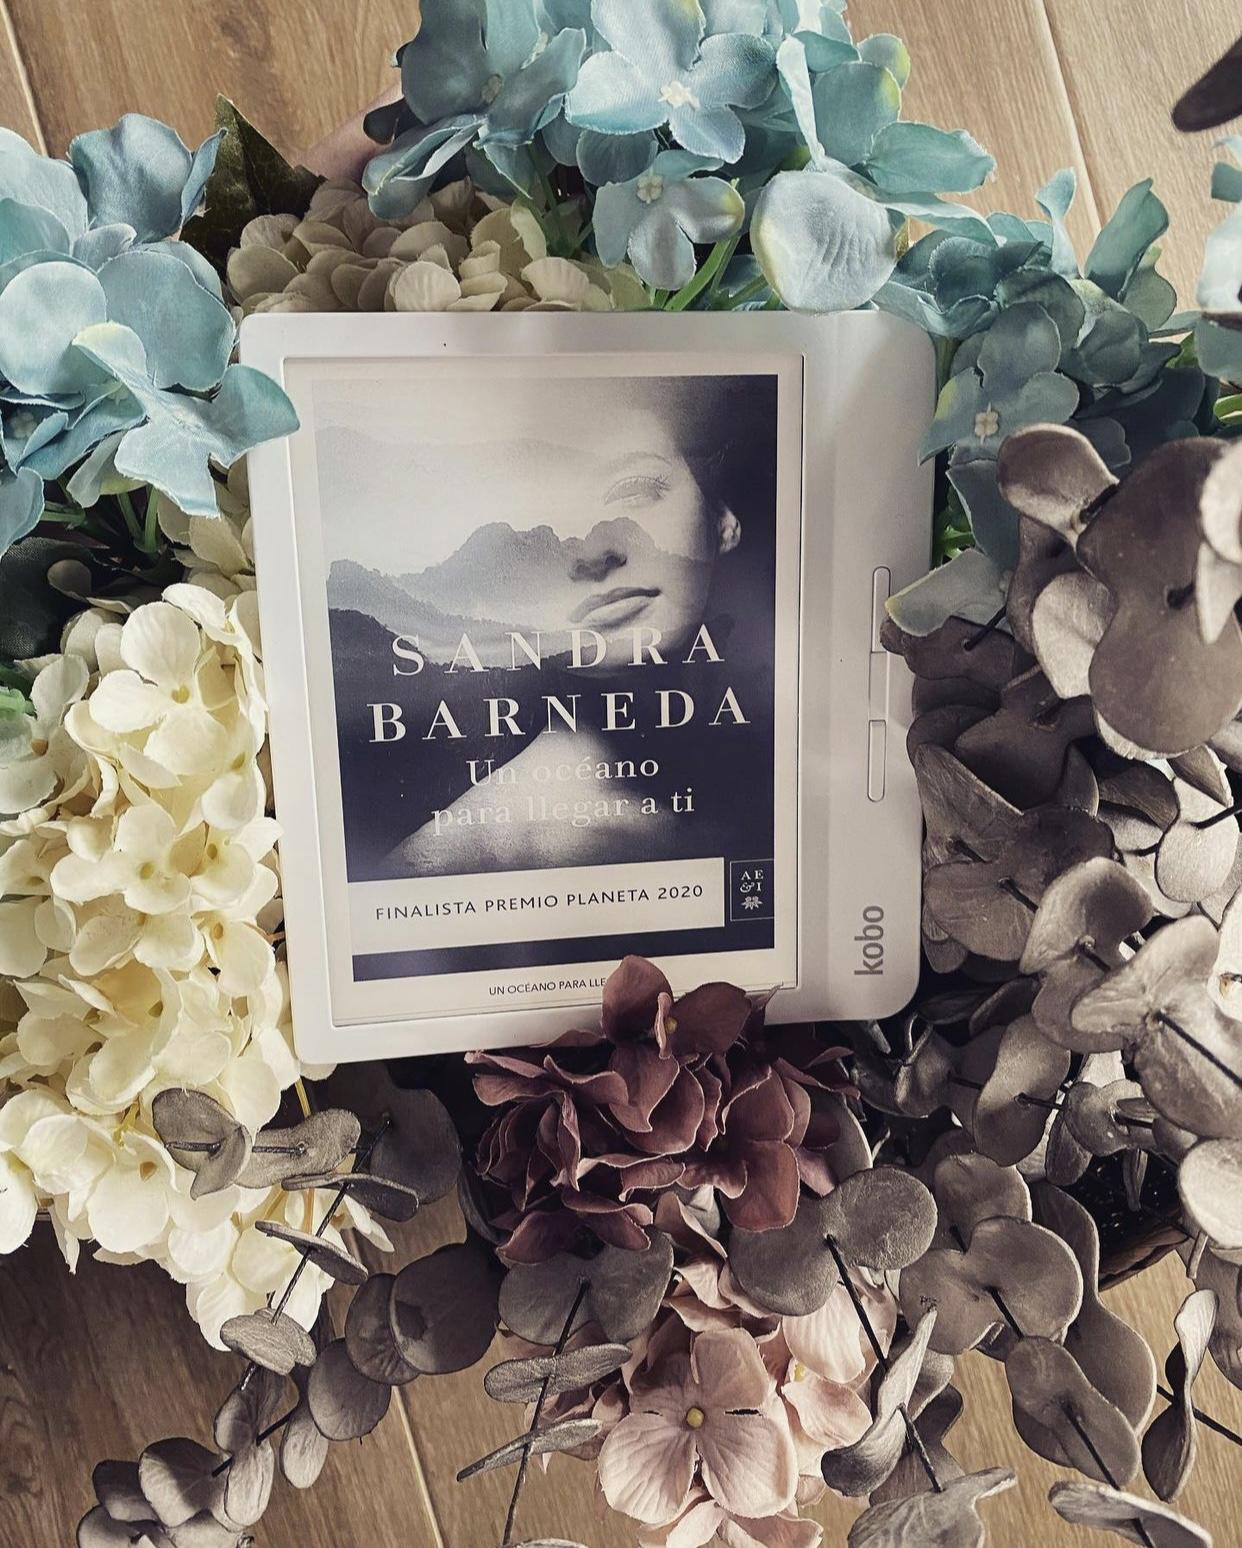 Un océano para llegar a ti de Sandra Barneda